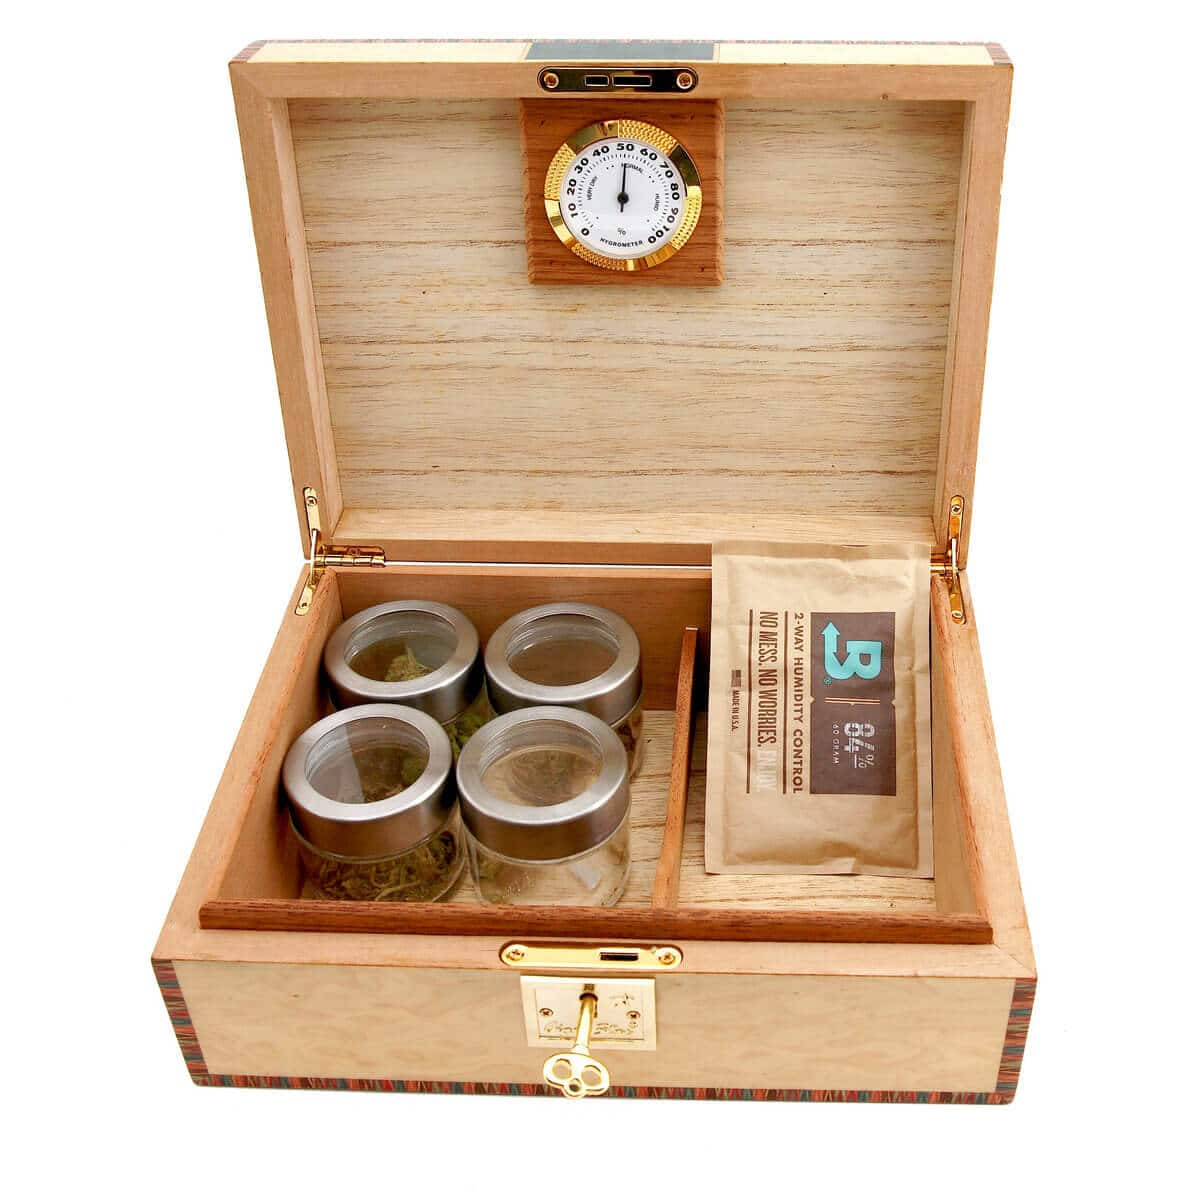 Weed Humdior Artisan Cannabis Humidor Shipped From Canada